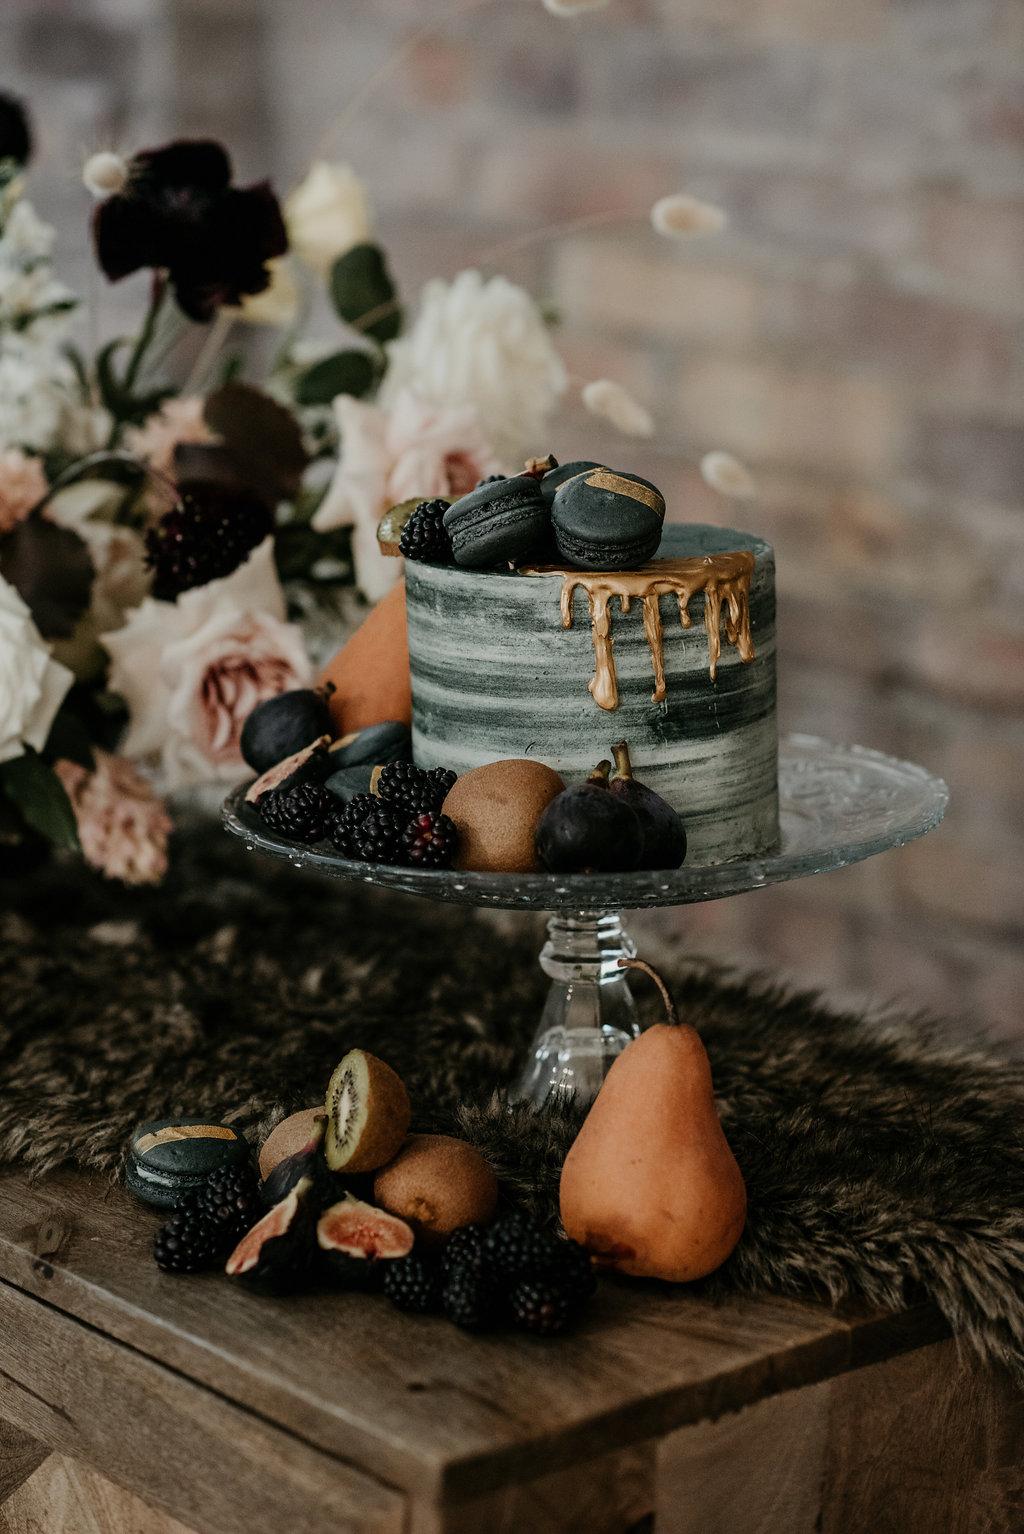 99 Sudbury, Barrie Wedding Planner, Wedding Designer, Elopement, Wedding Planner, Toronto Wedding Planner, Floral Backdrop, Romantic Elopement, Wedding Cake, Moody Wedding Cake, Barrie Wedding Cake, Toronto Wedding Cake